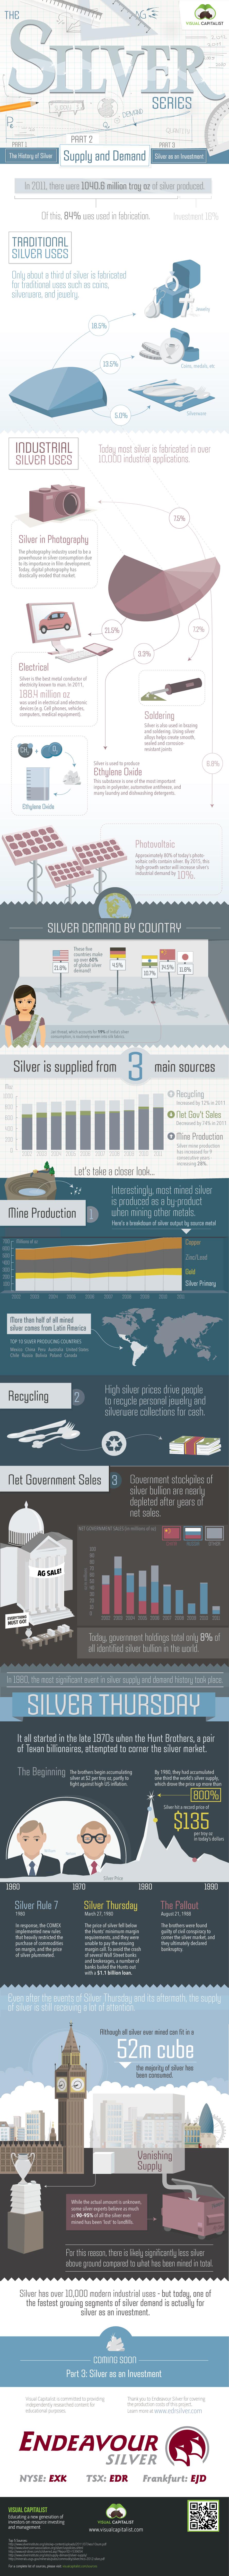 silver-supply-demand-infographic.jpg